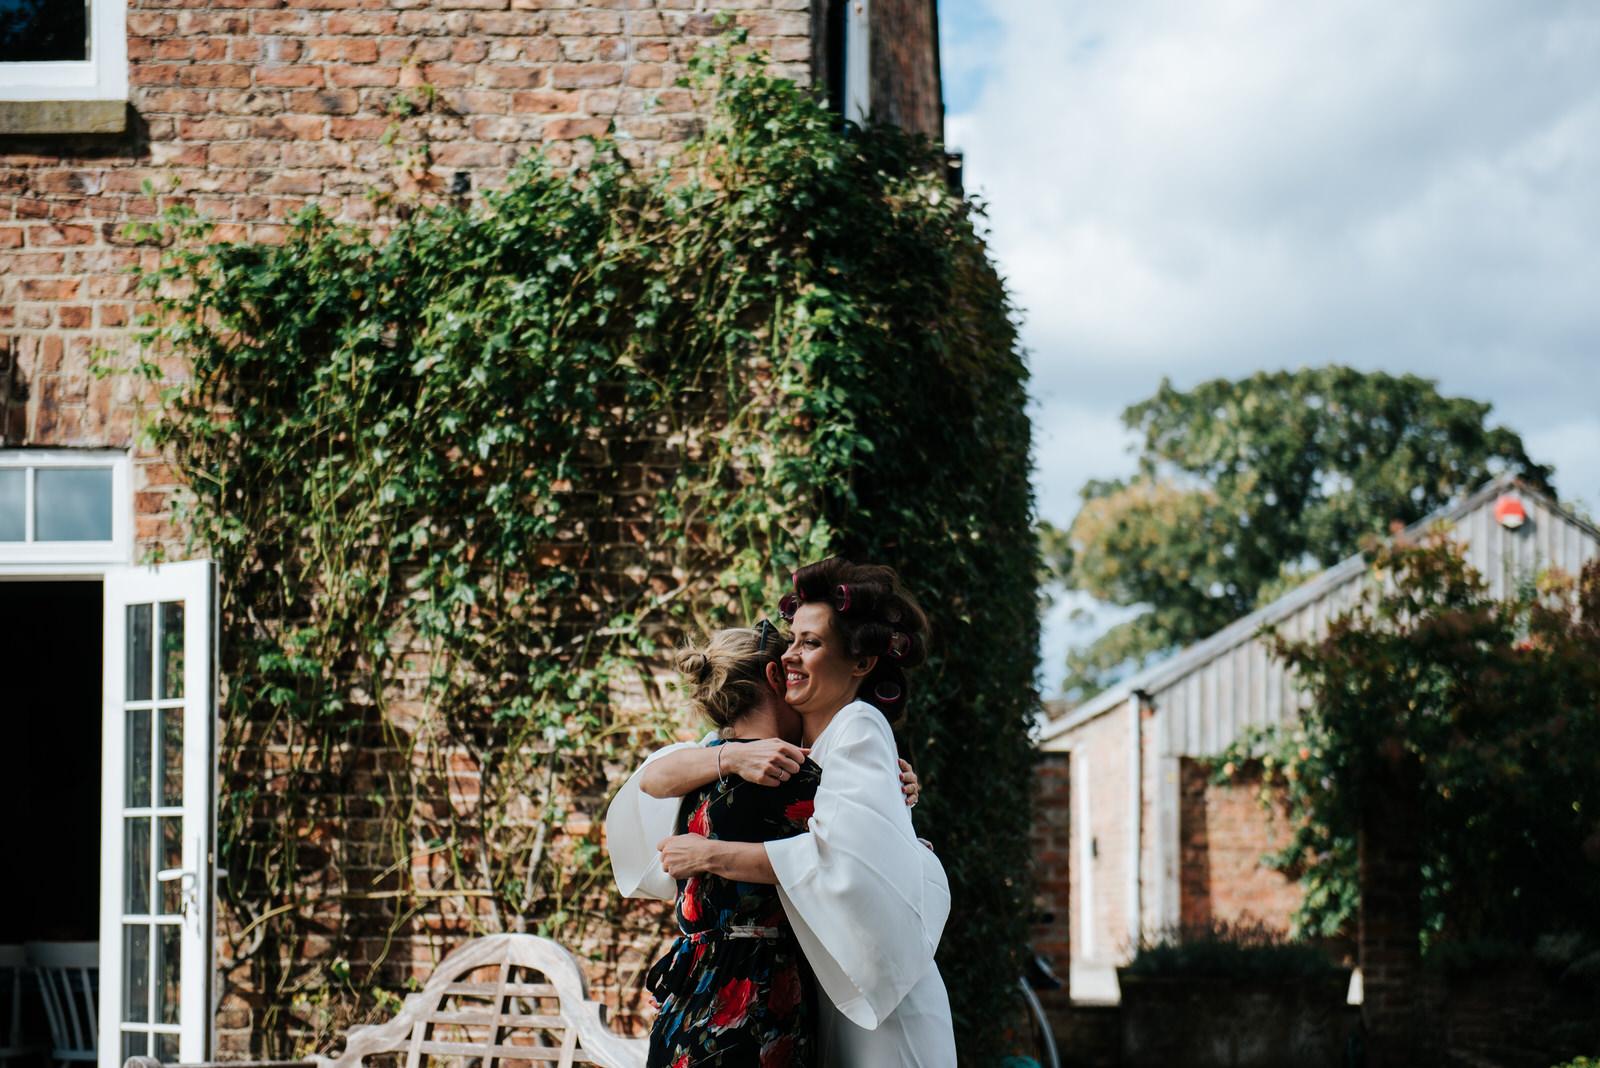 Bride hugs lifelong fround outside house where she gets ready